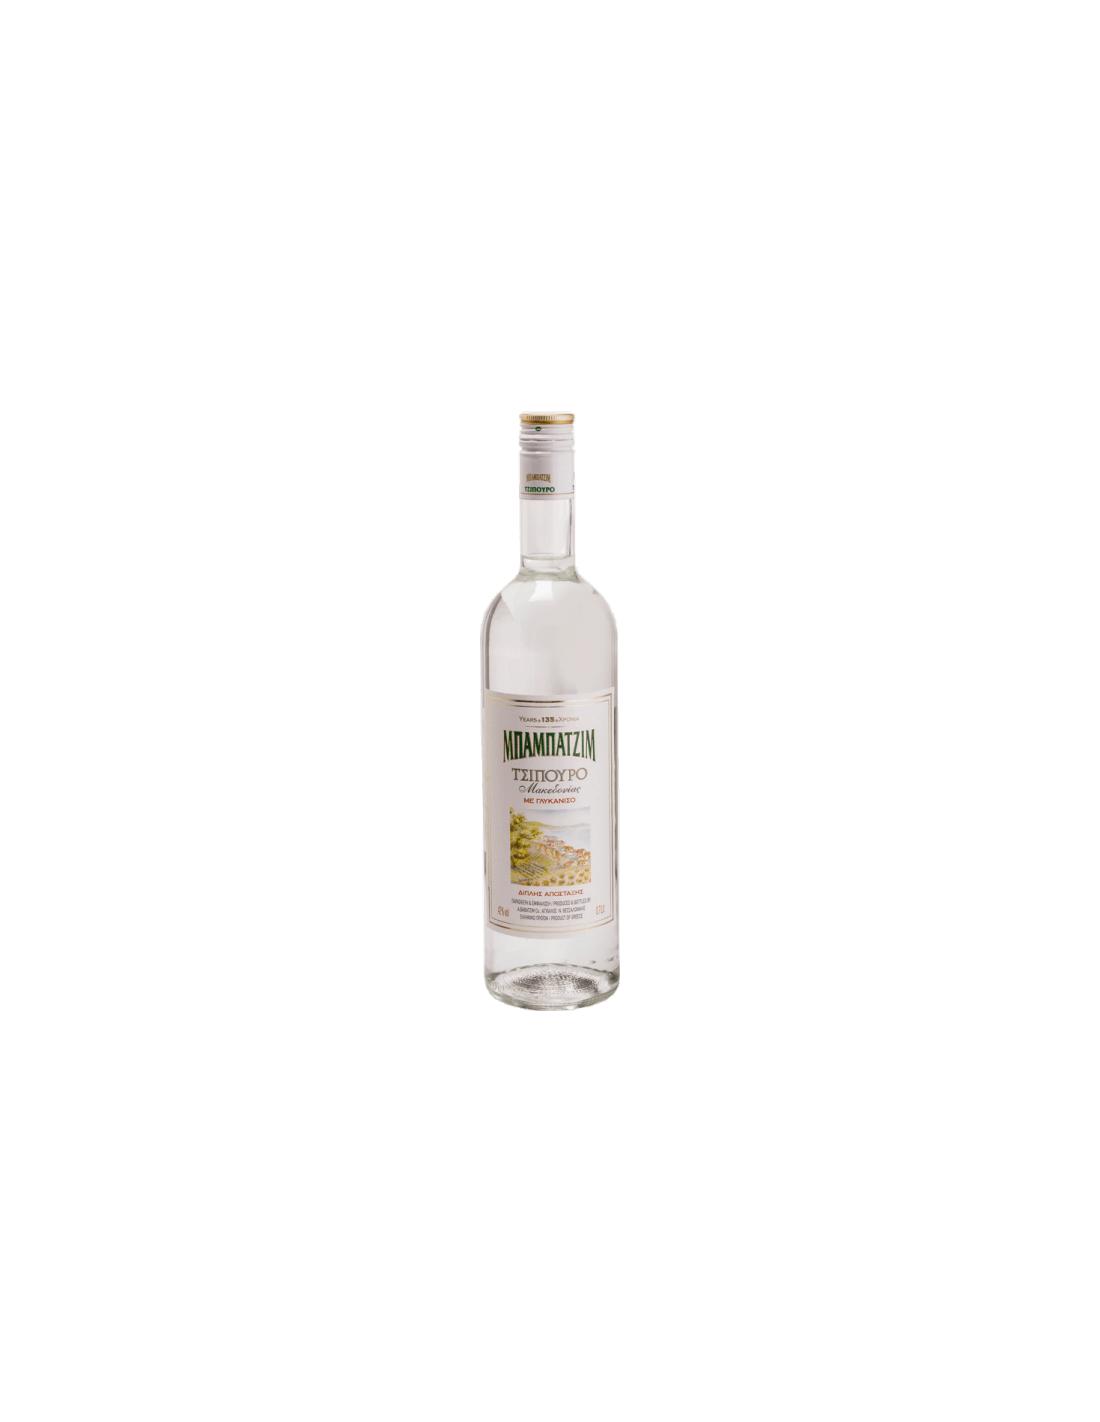 Bautura traditionala digestiva Babatzim Anise, 42% alc., 0.7L